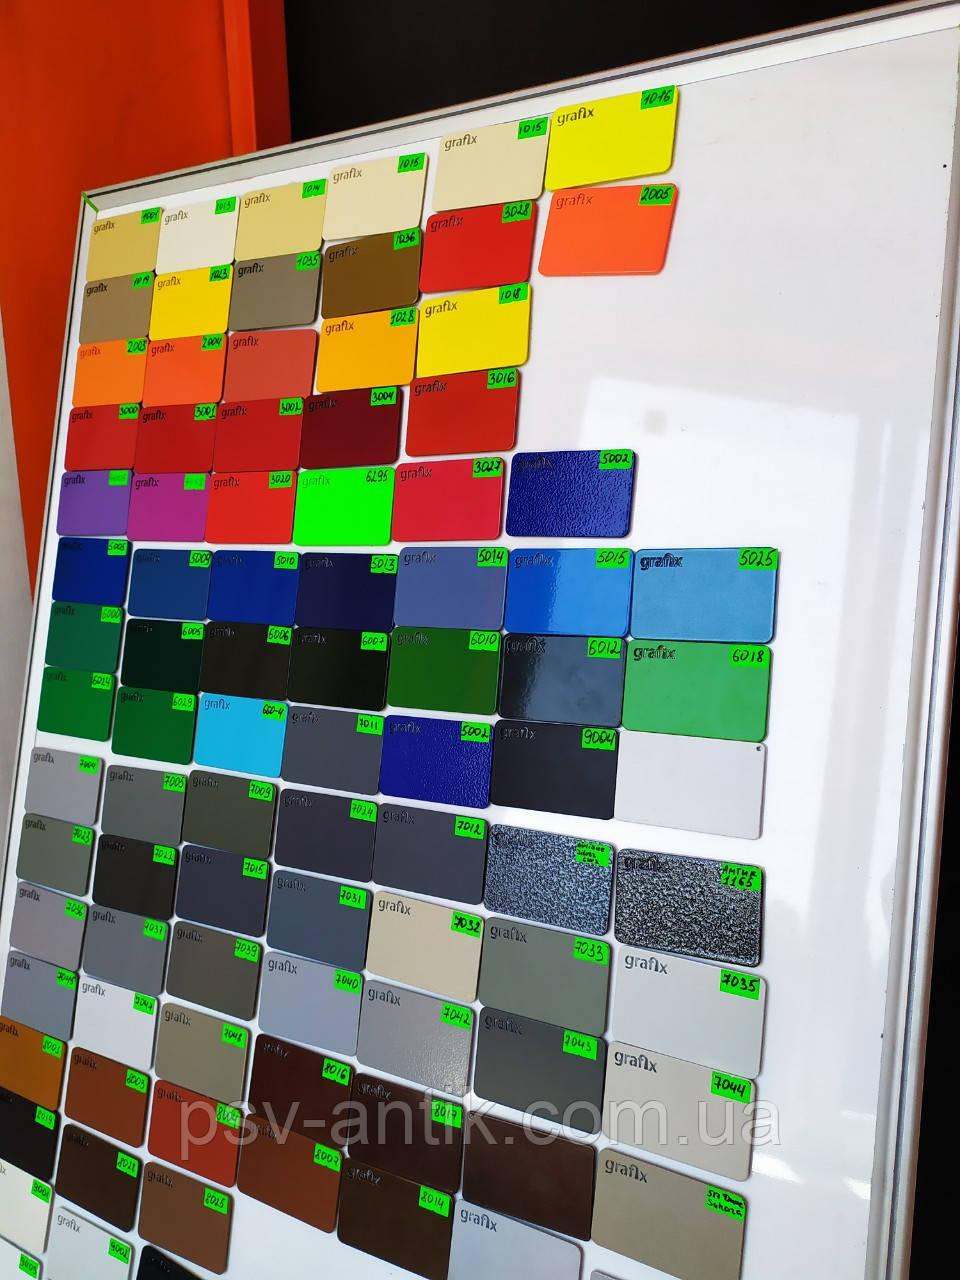 Порошковая краска глянцевая, полиэфирная, архитектурная, 3009